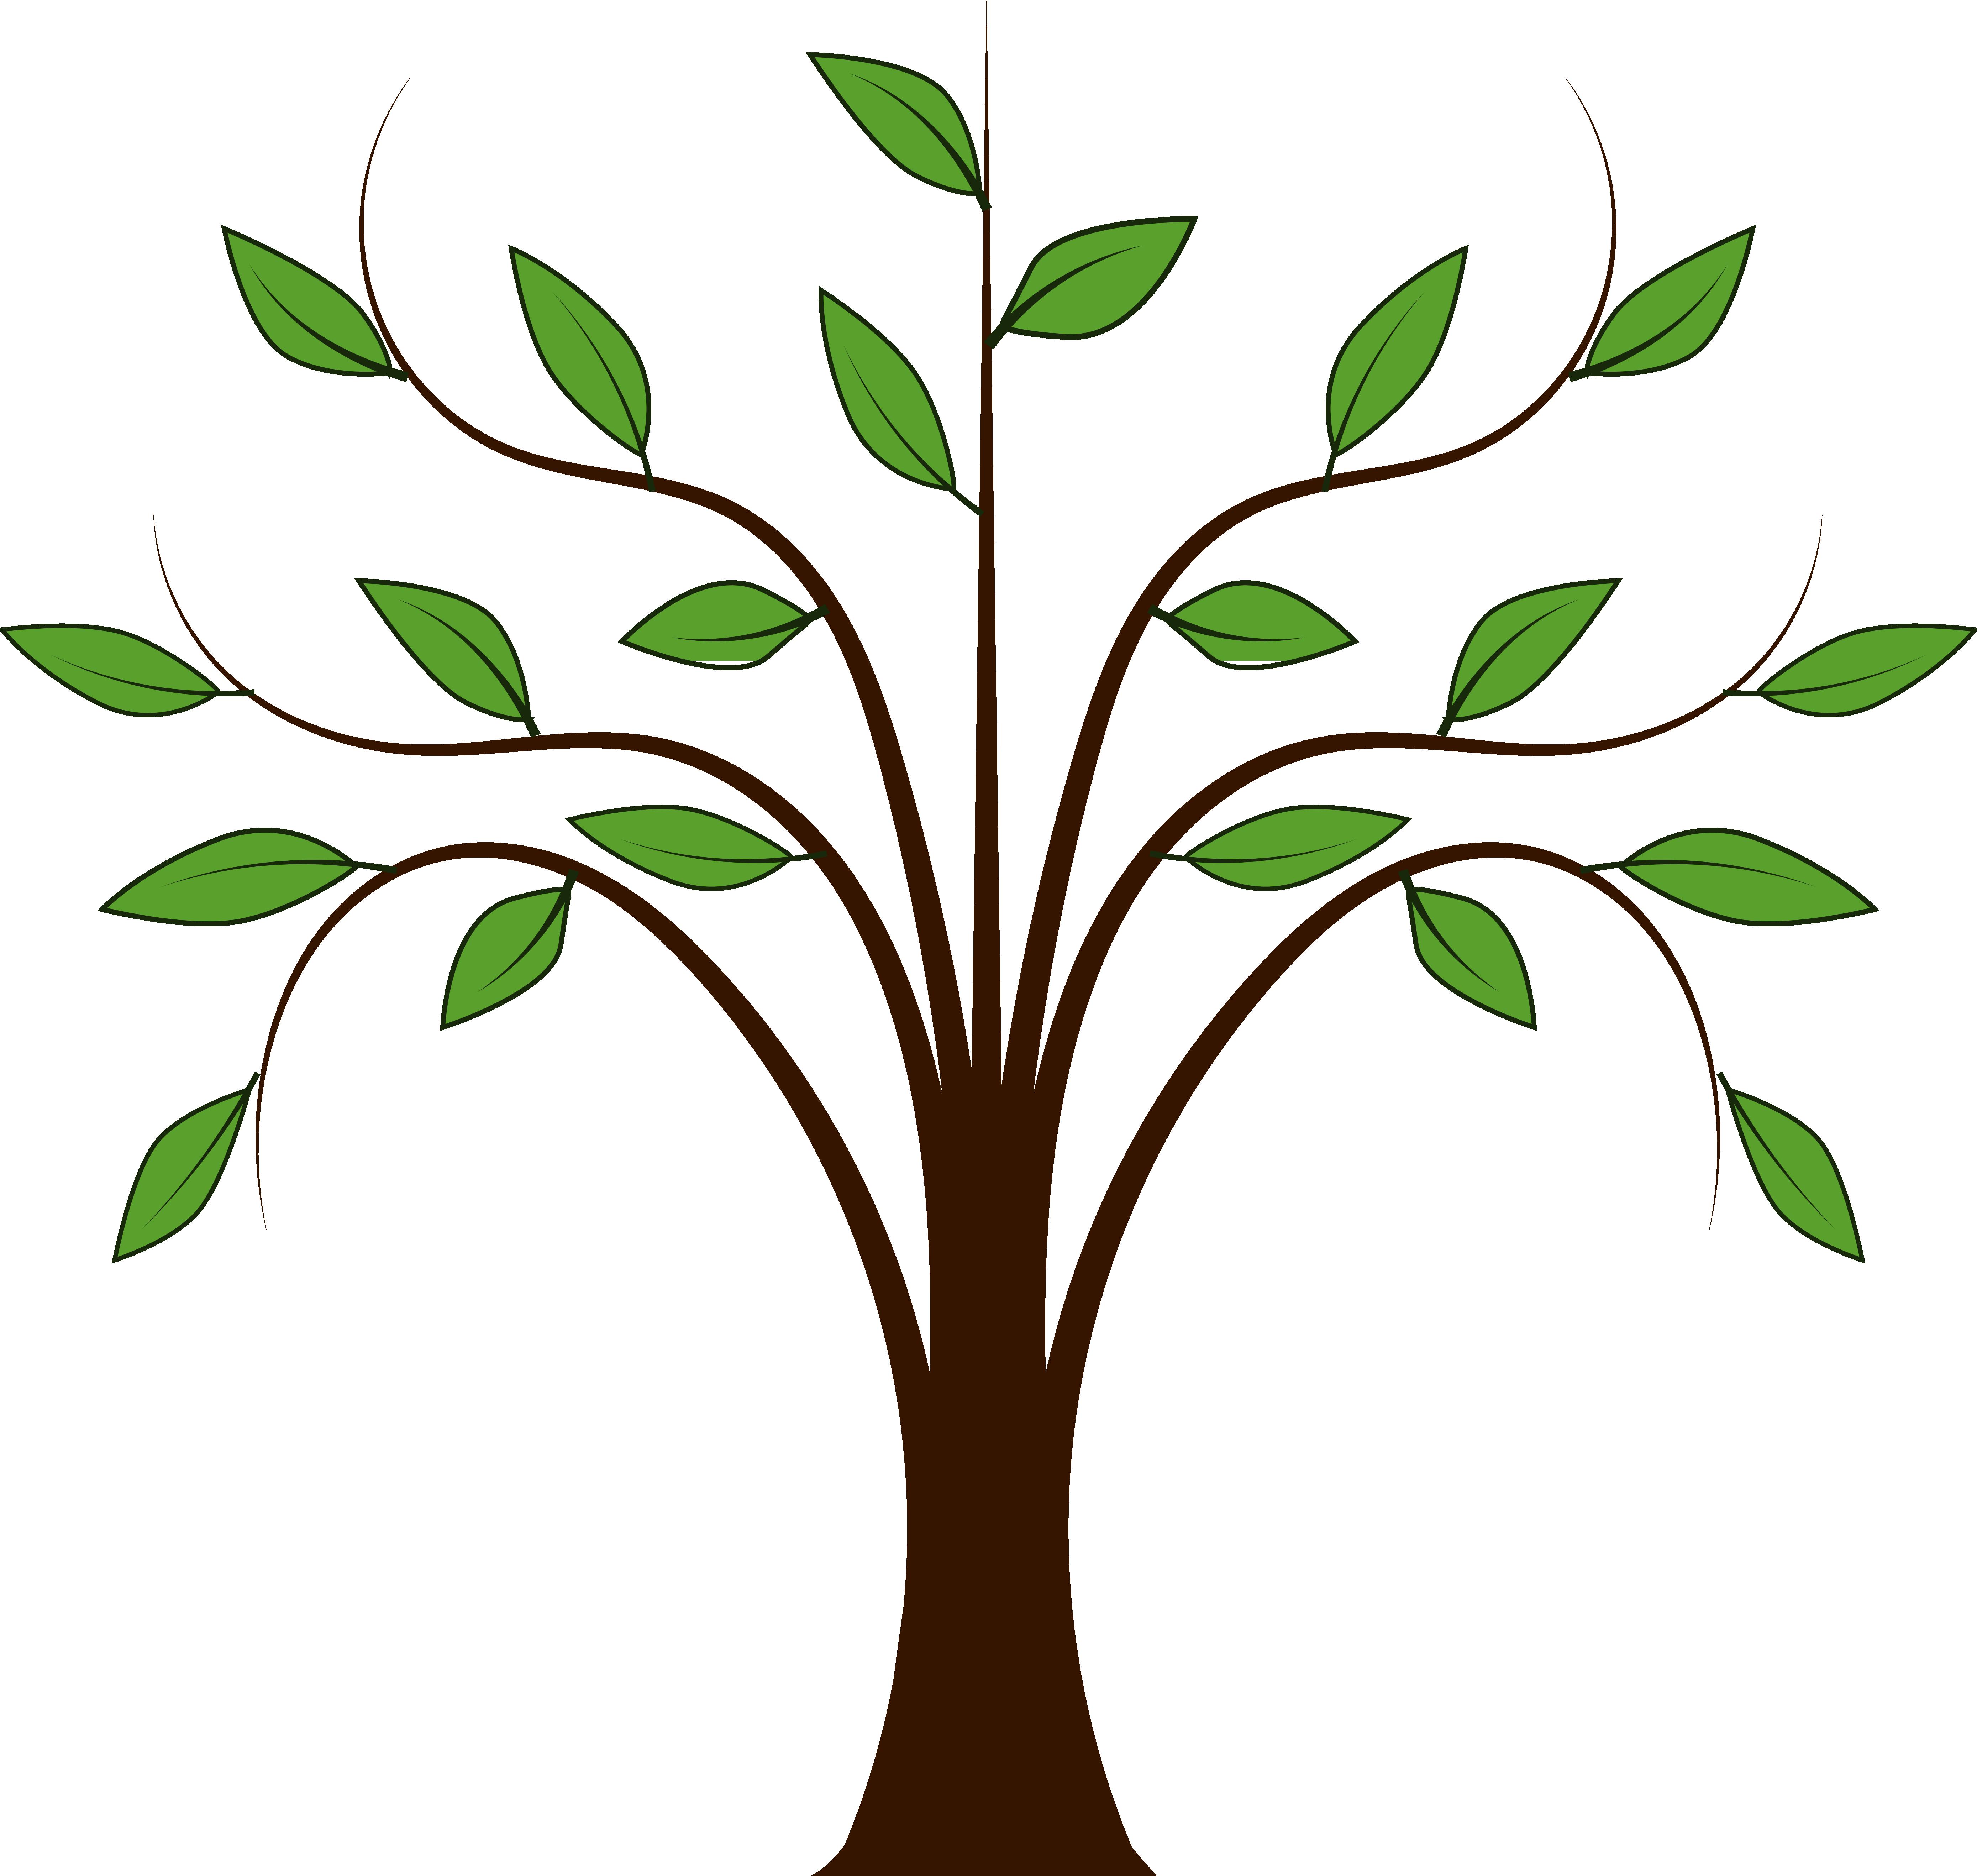 clipart downloads u0026middot; clipart f-clipart downloads u0026middot; clipart family u0026middot; clipart tree-15